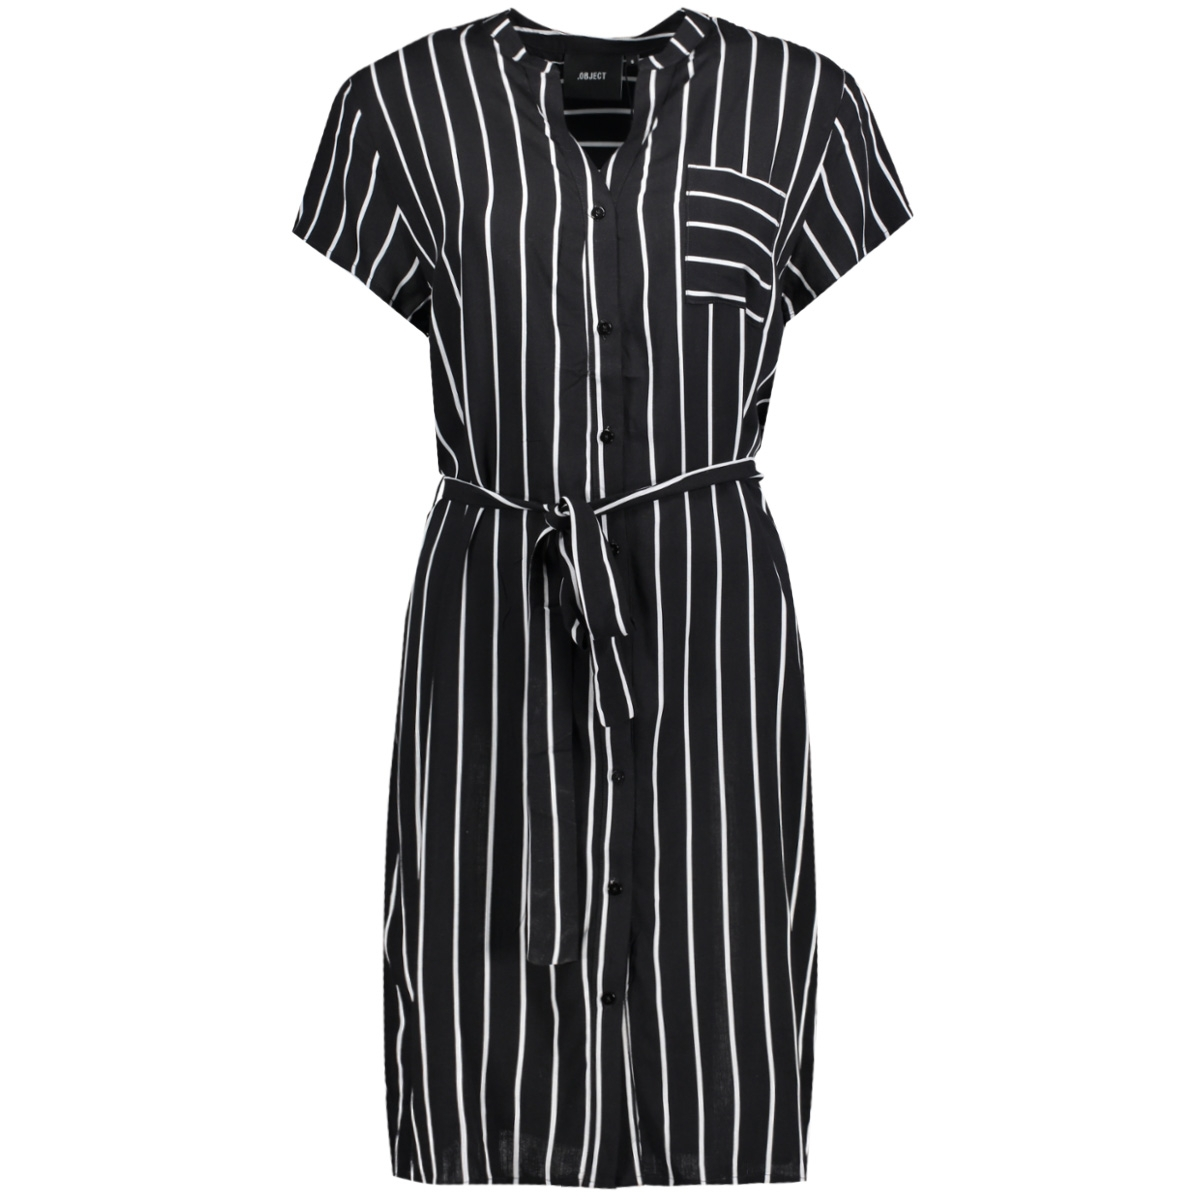 objbirdy s/s abk dress a 23026168 object jurk black/white